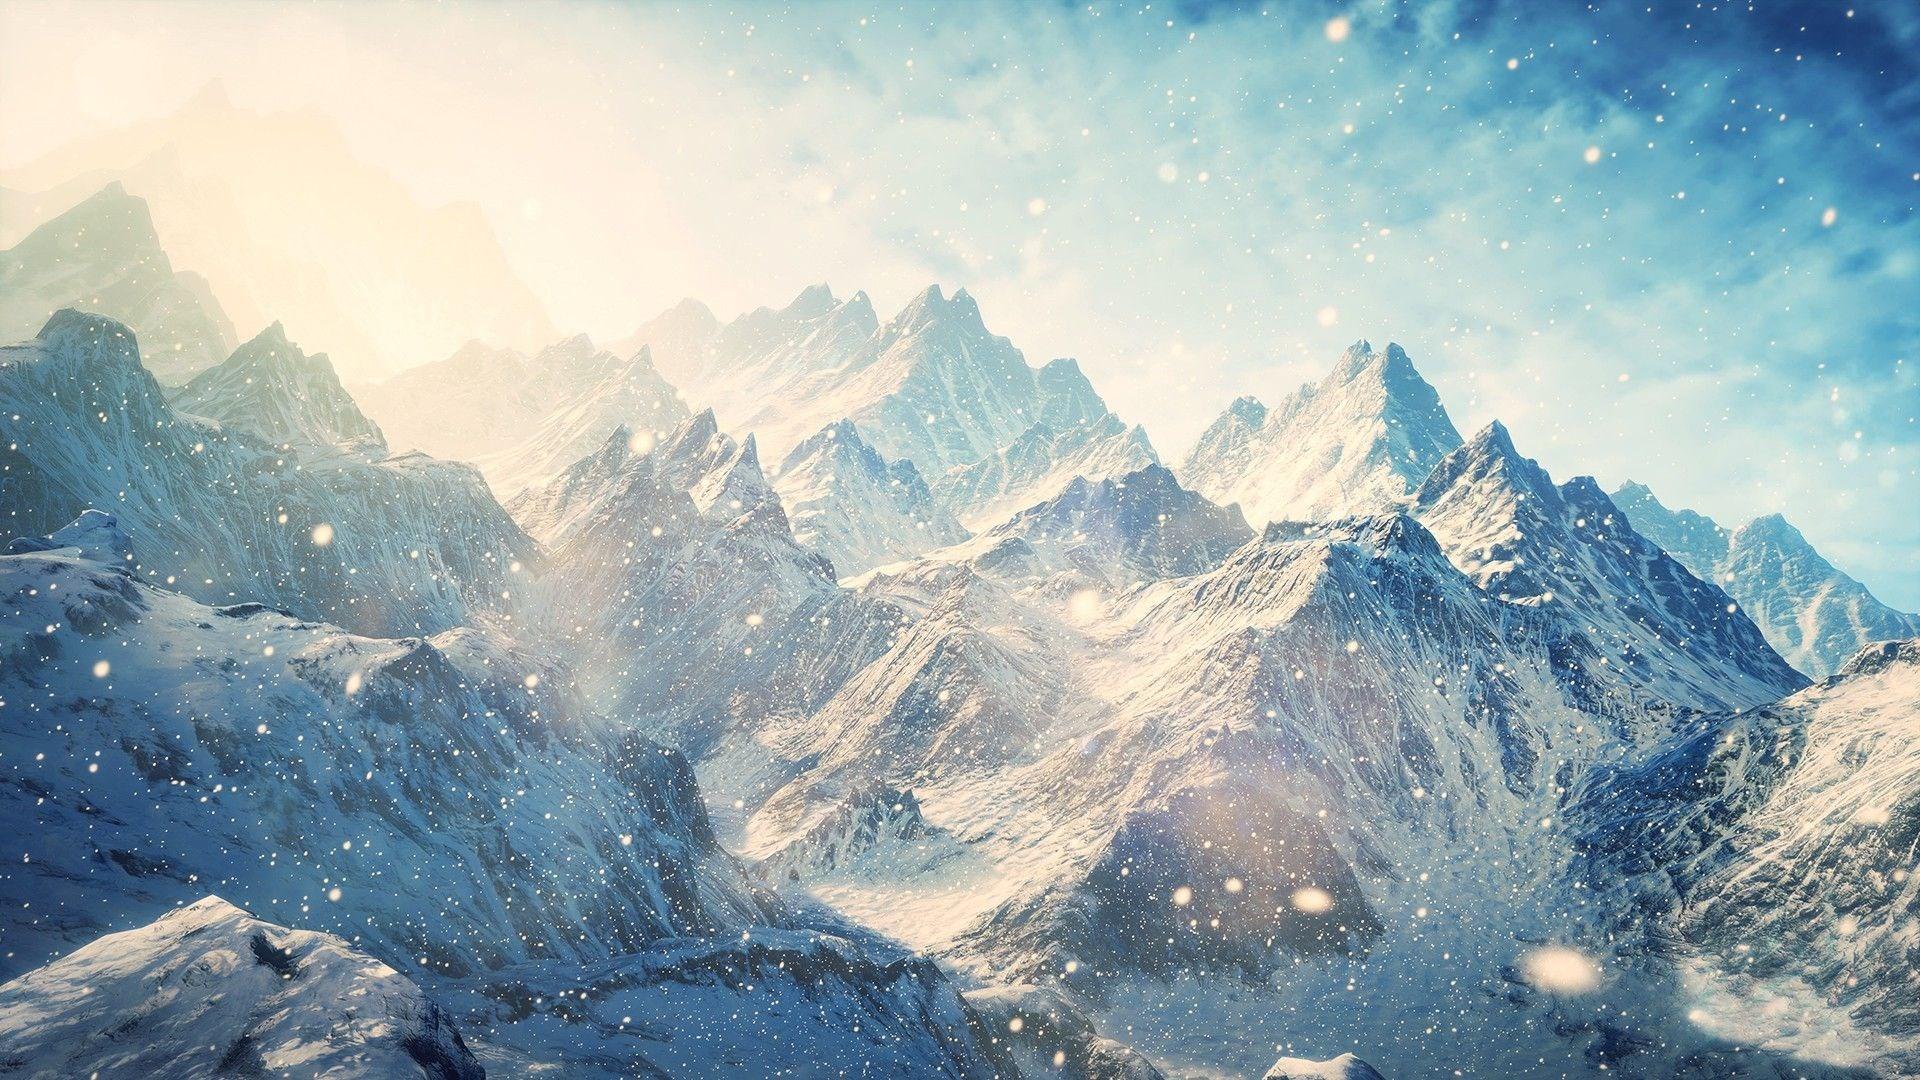 snow background desktop free